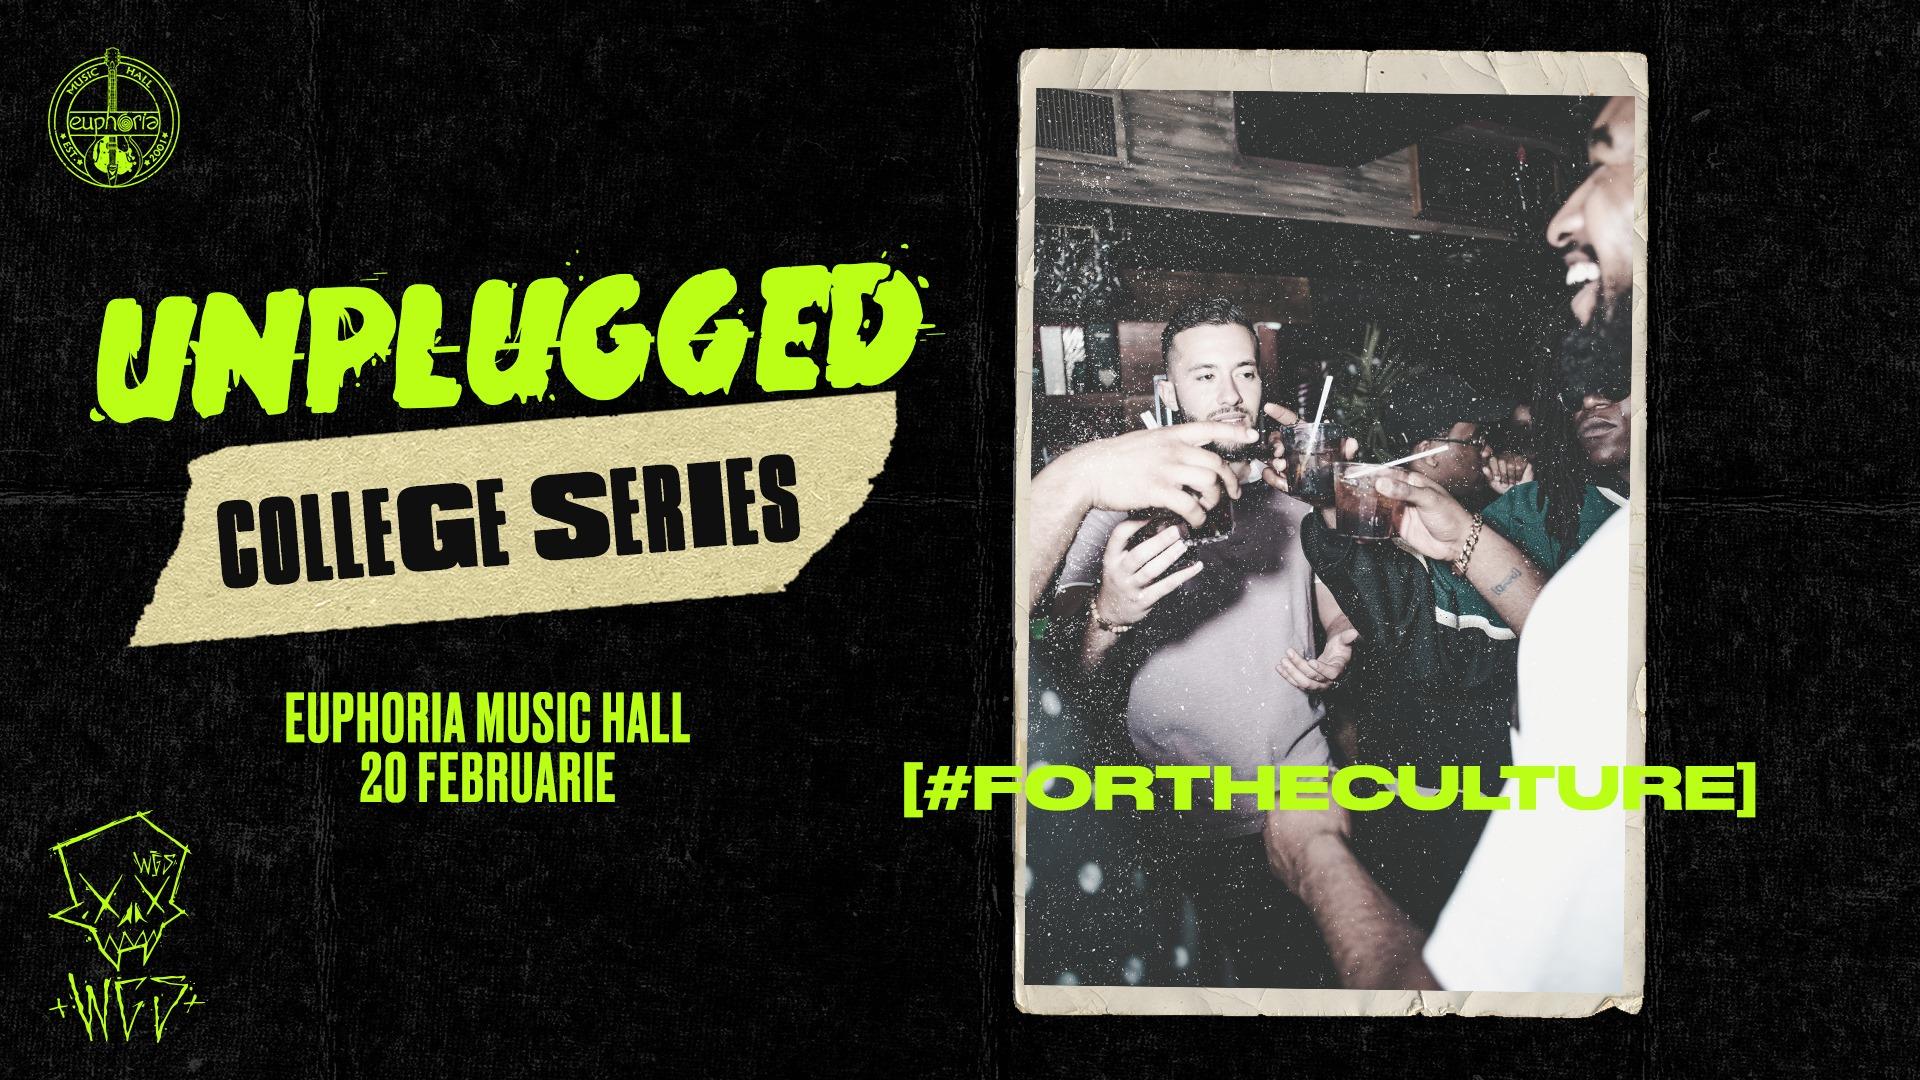 UNPLUGGED | College Series @ Euphoria Music Hall